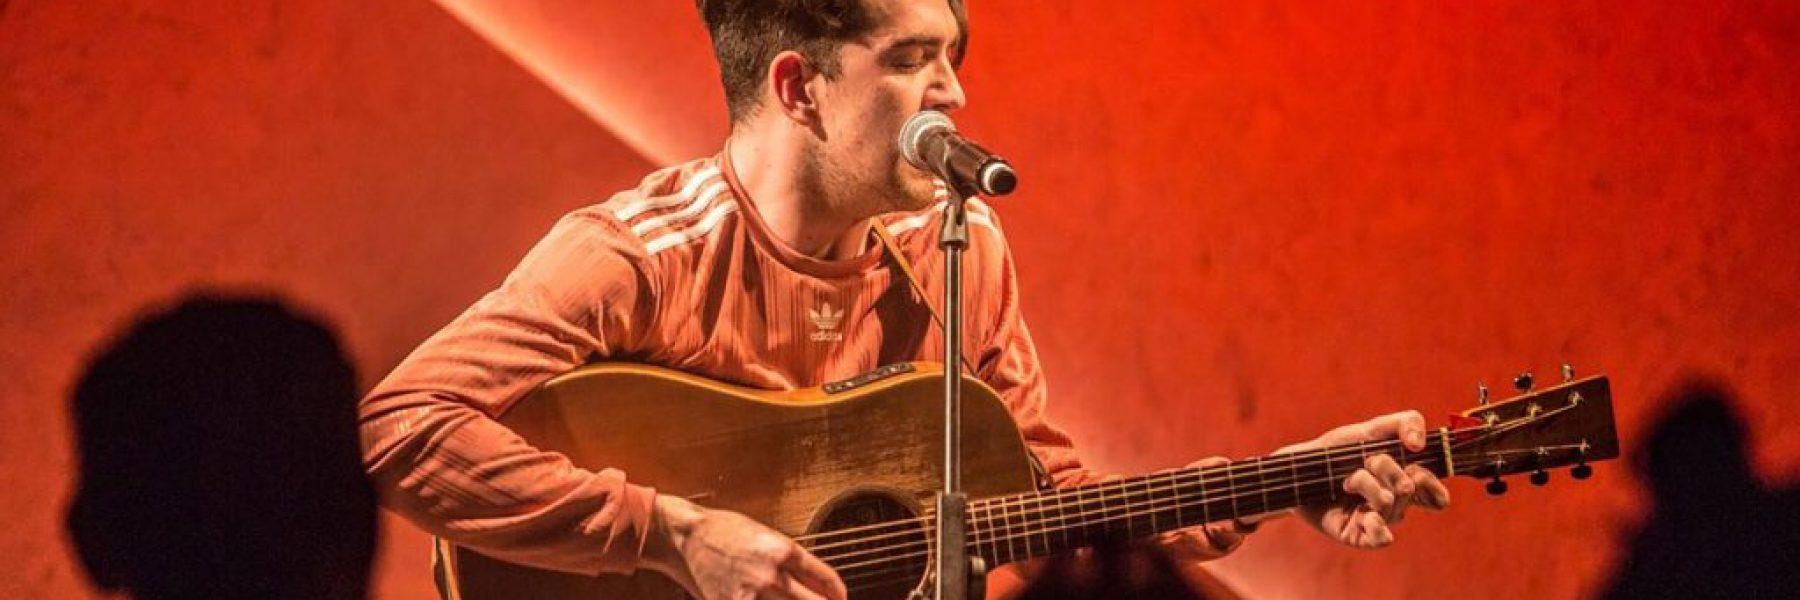 Live Events - St Patrick's Festival, Dublin